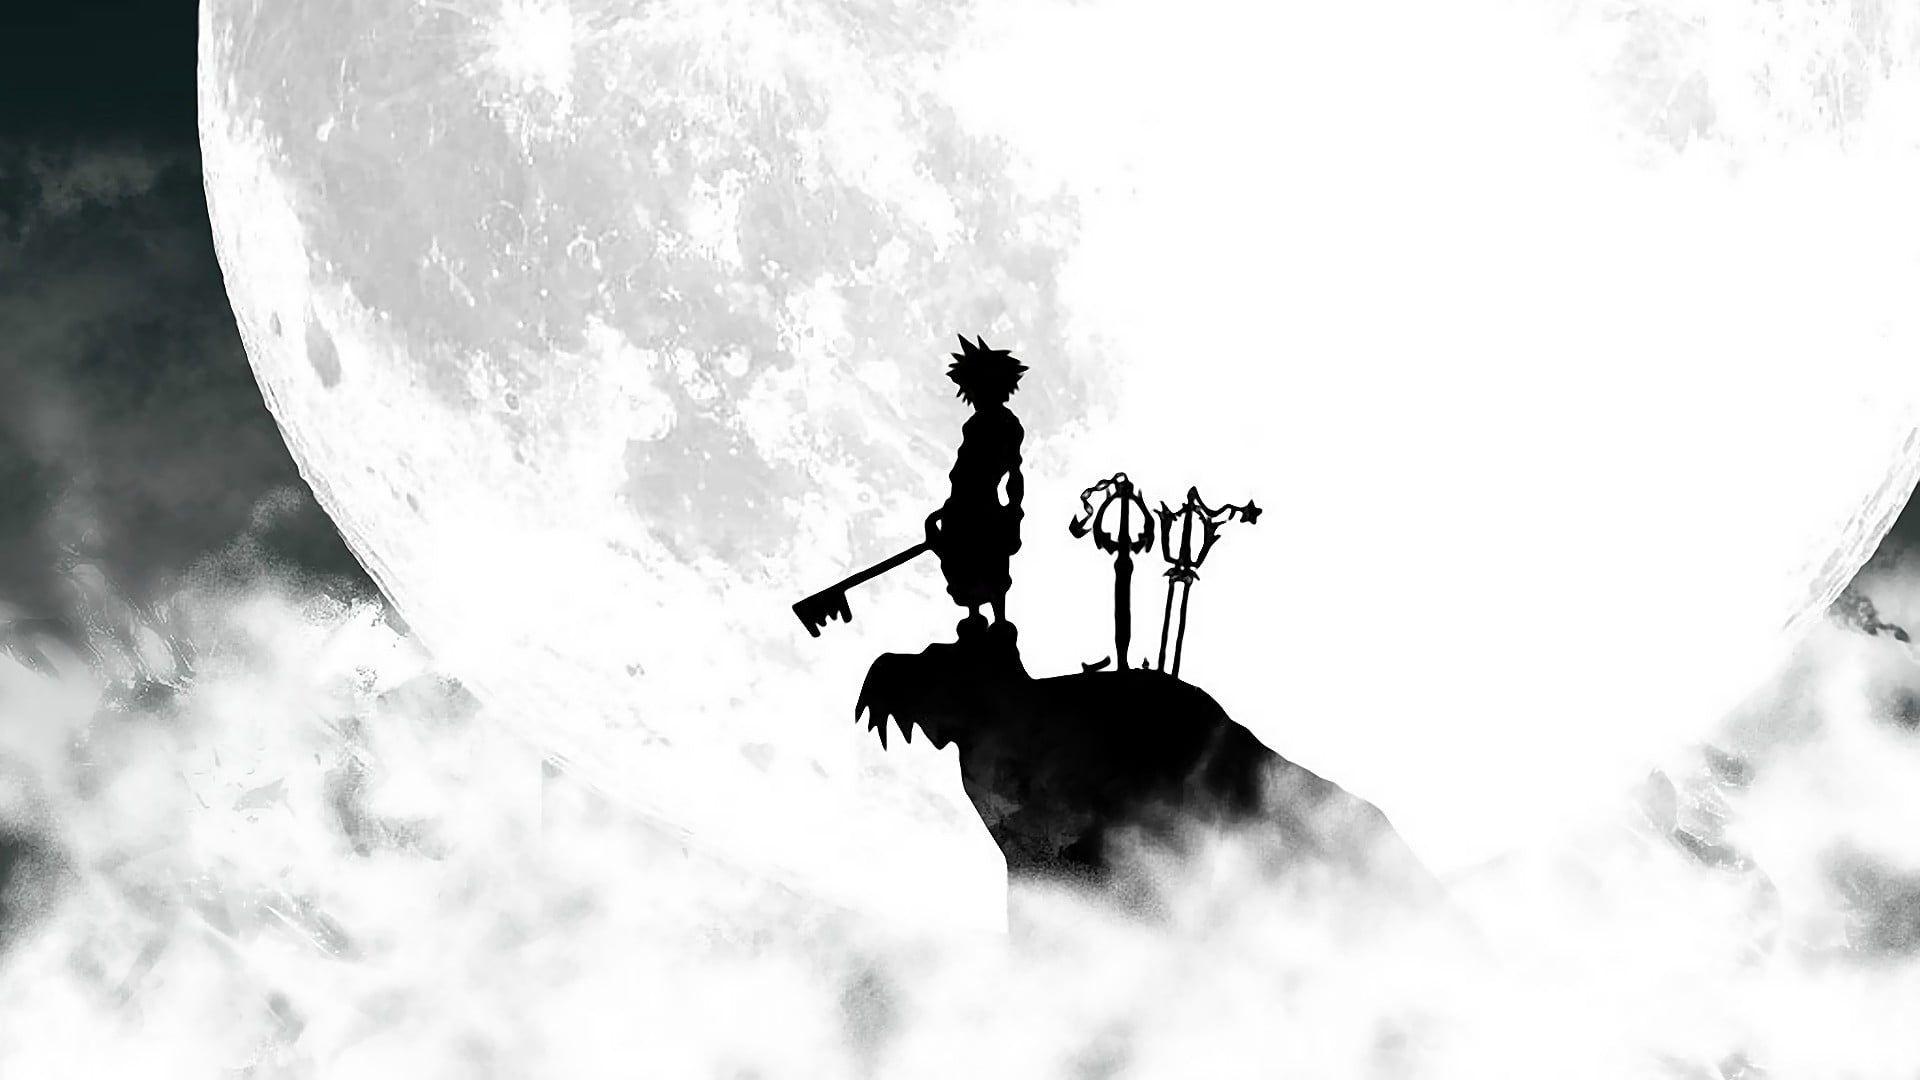 Silhouette Of Sora From Kingdom Hearts Anime Kingdom Hearts Video Games Sora Kingdom Hearts Key Kingdom Hearts Wallpaper Kingdom Hearts Sora Kingdom Hearts